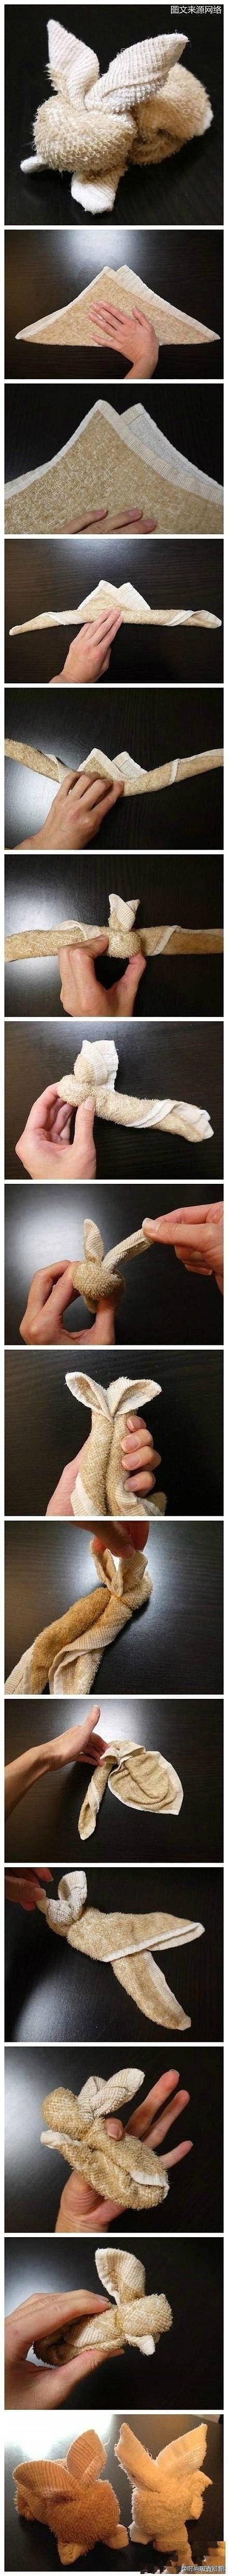 Rabbit towel folding: